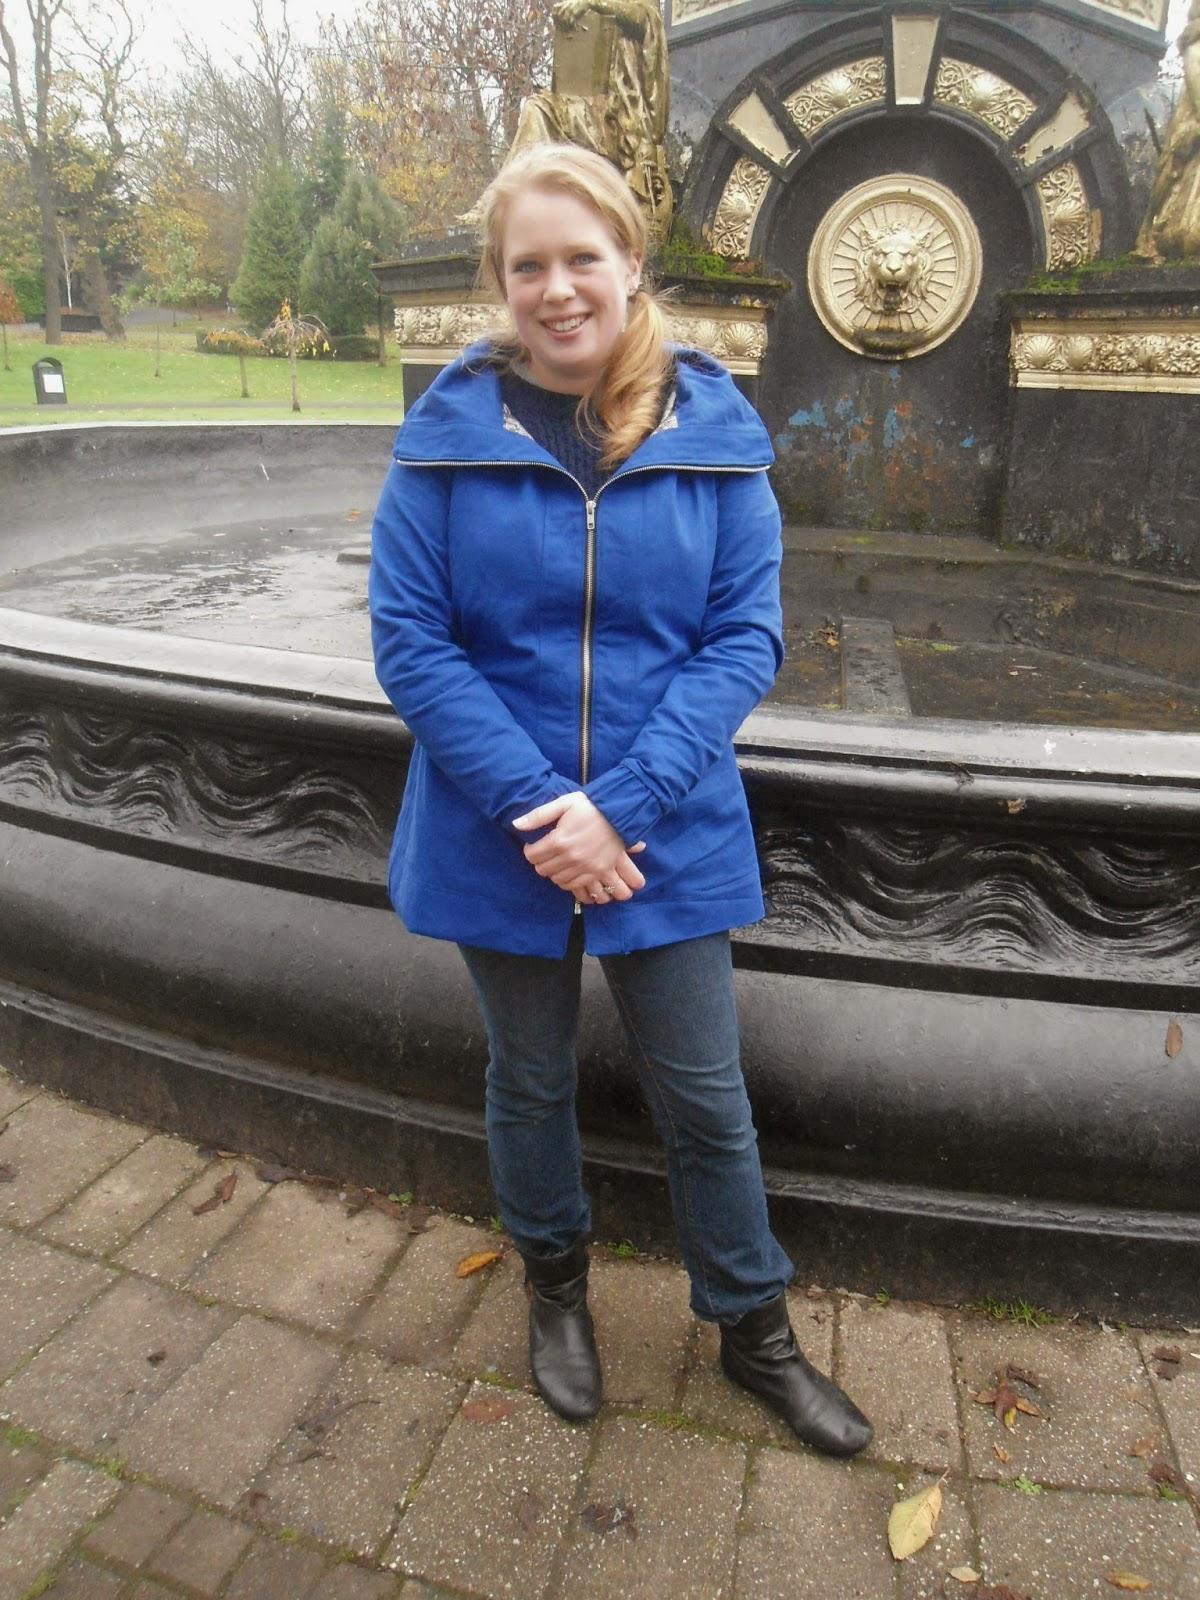 http://jennifercatherineshaw.blogspot.com/2014/12/completed-minoru-jacket.html